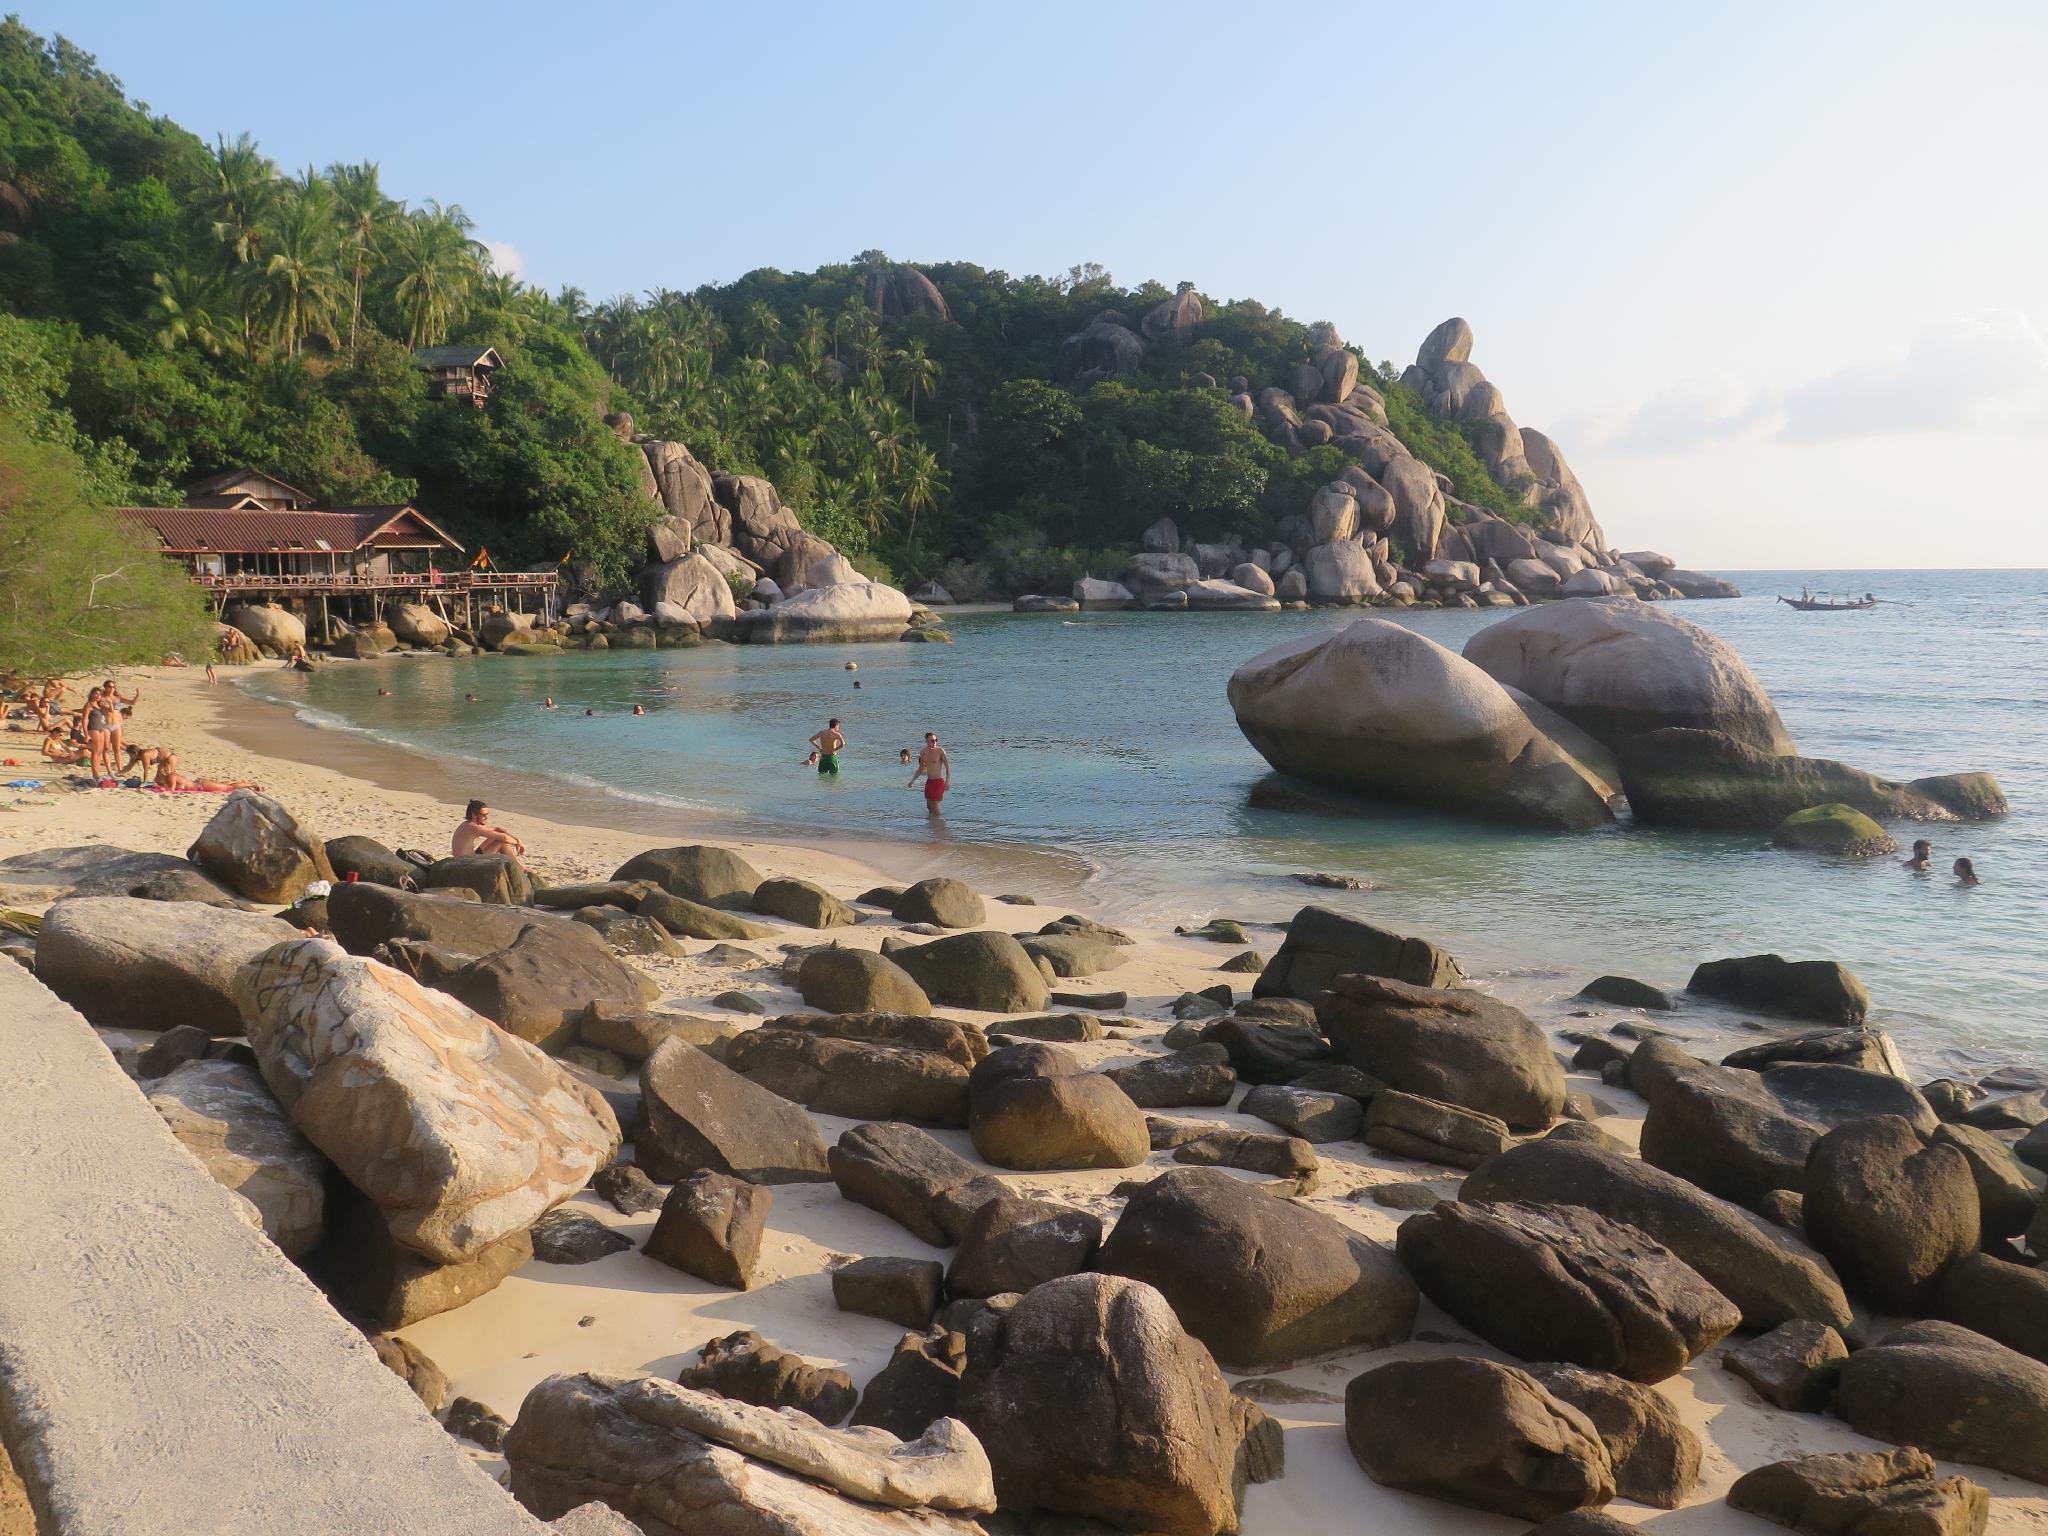 Freedom Beach Resort ฟรีด้อม บีช รีสอร์ต